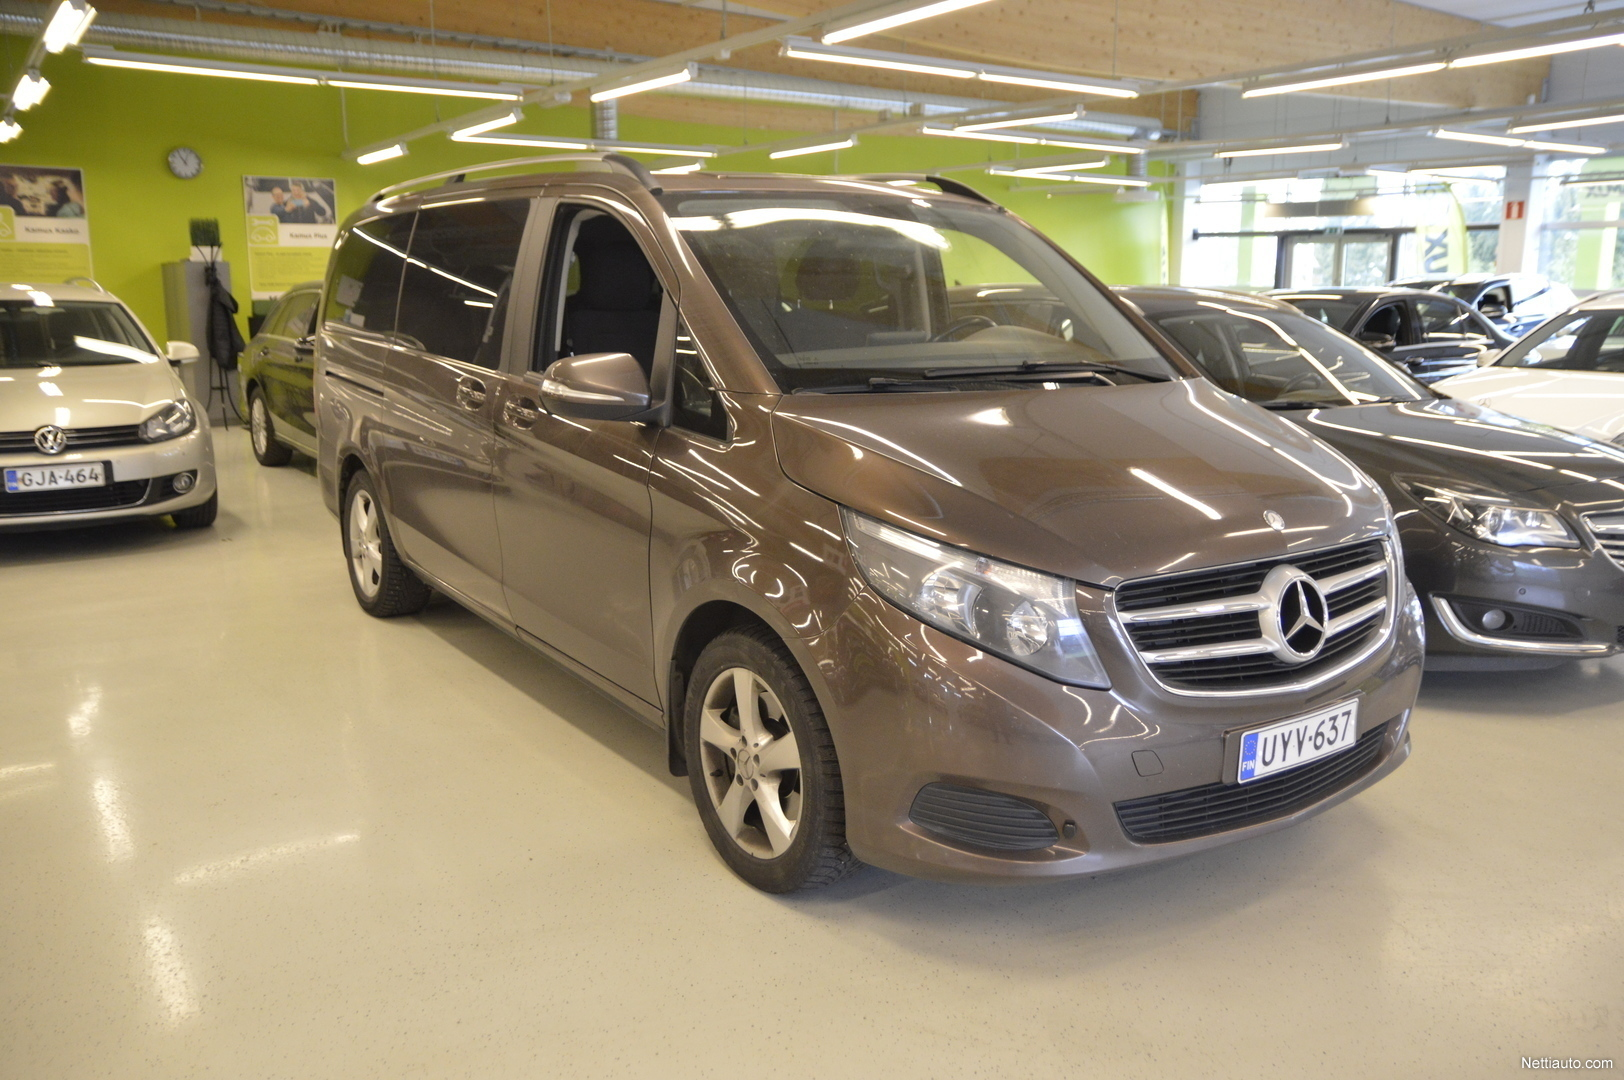 Mercedes Benz Dealers >> Mercedes Benz V 220 Cdi Keskipitka A2 A Mpv 2015 Used